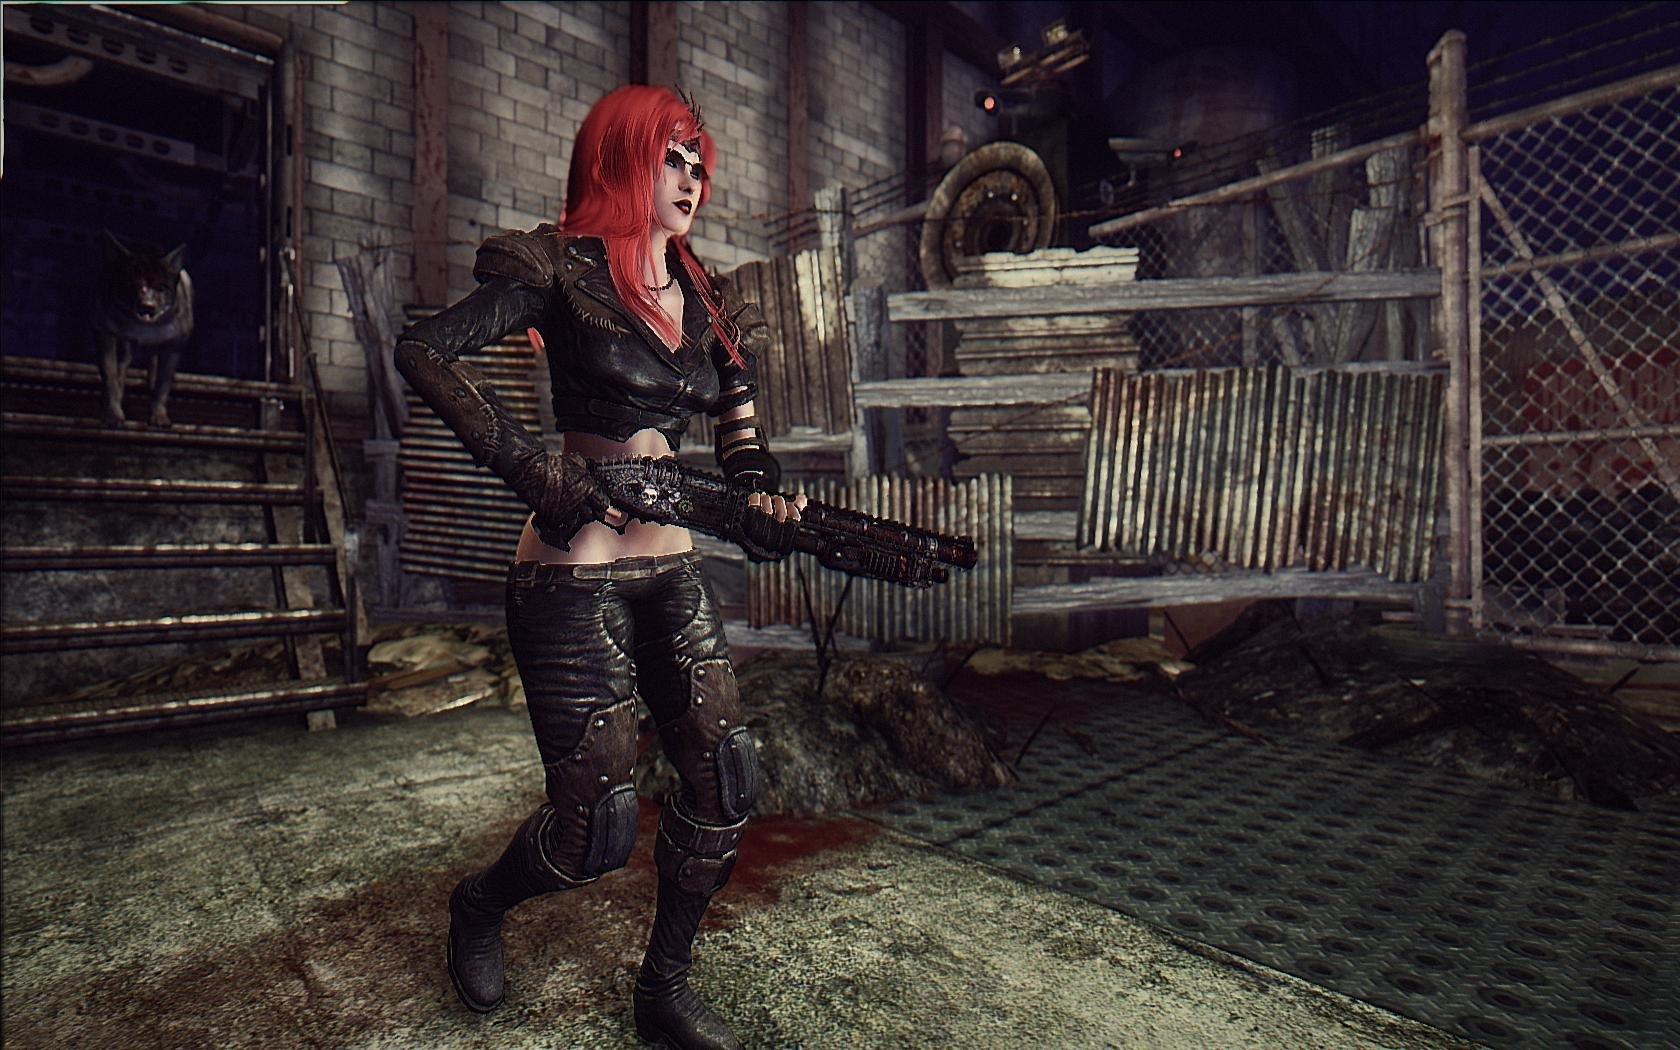 Fallout3 2019-04-17 20-29-36-57